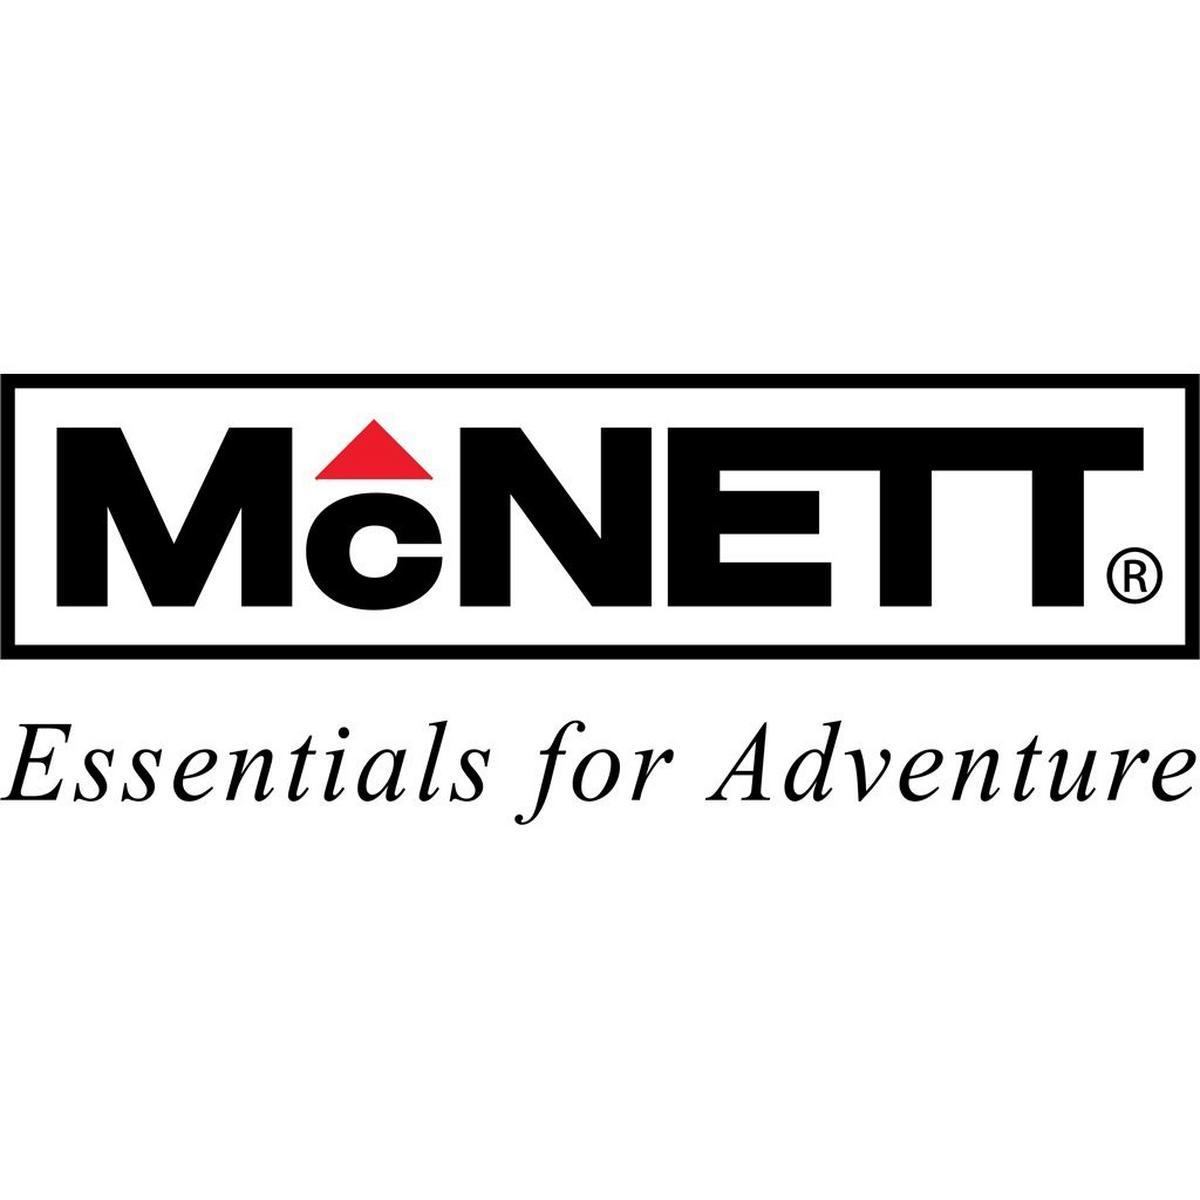 Mcnett Gear Aid (McNett) Seam Grip +WP Waterproof Sealant and Adhesive